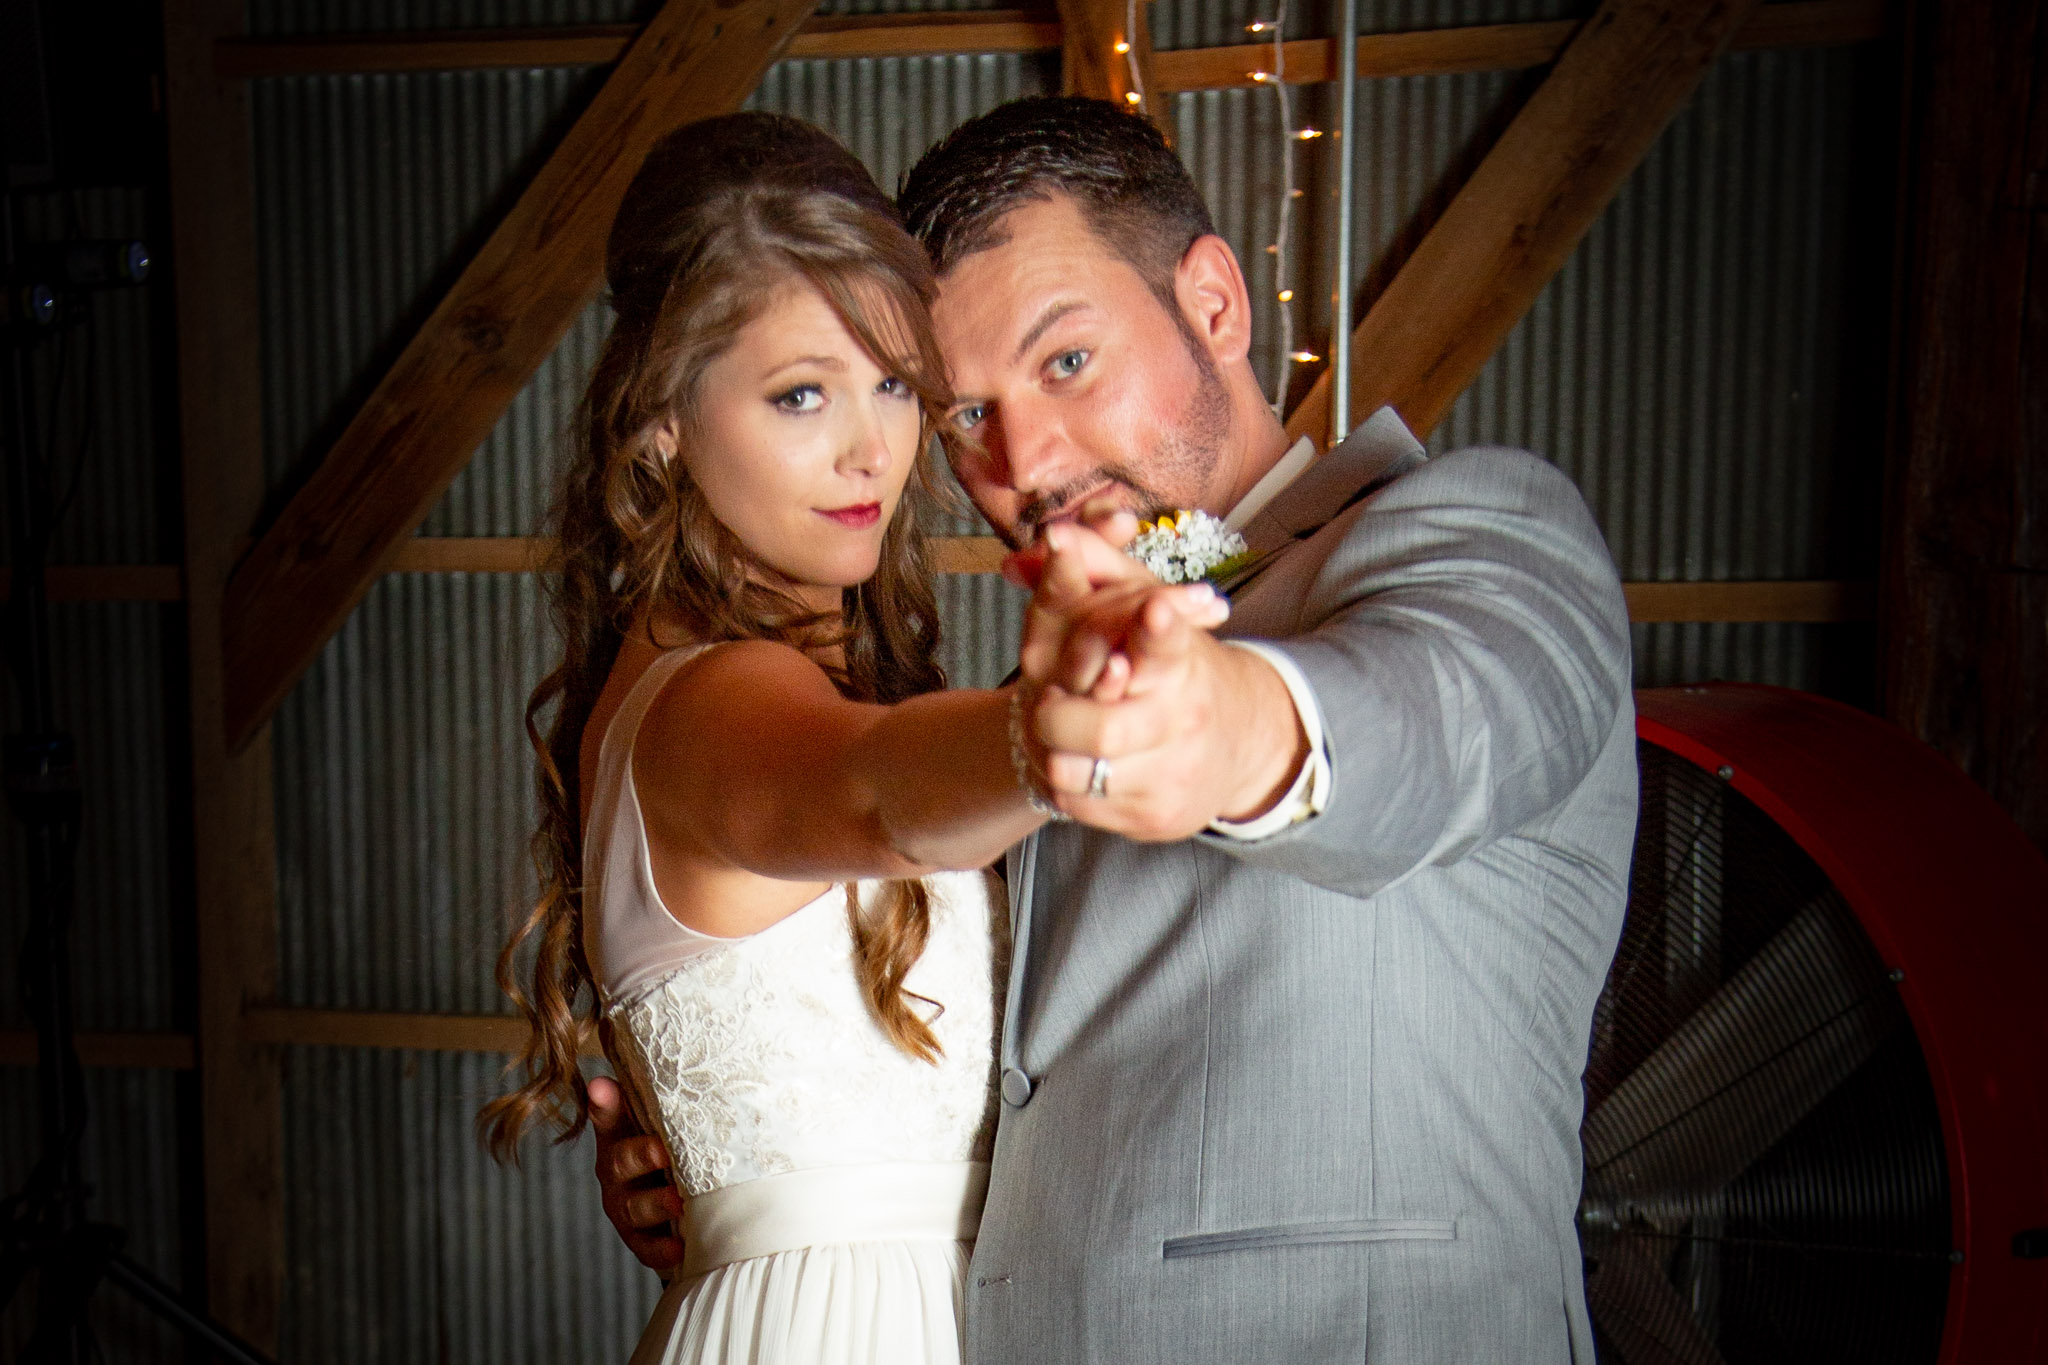 st louis barn wedding photography (73 of 102).JPG